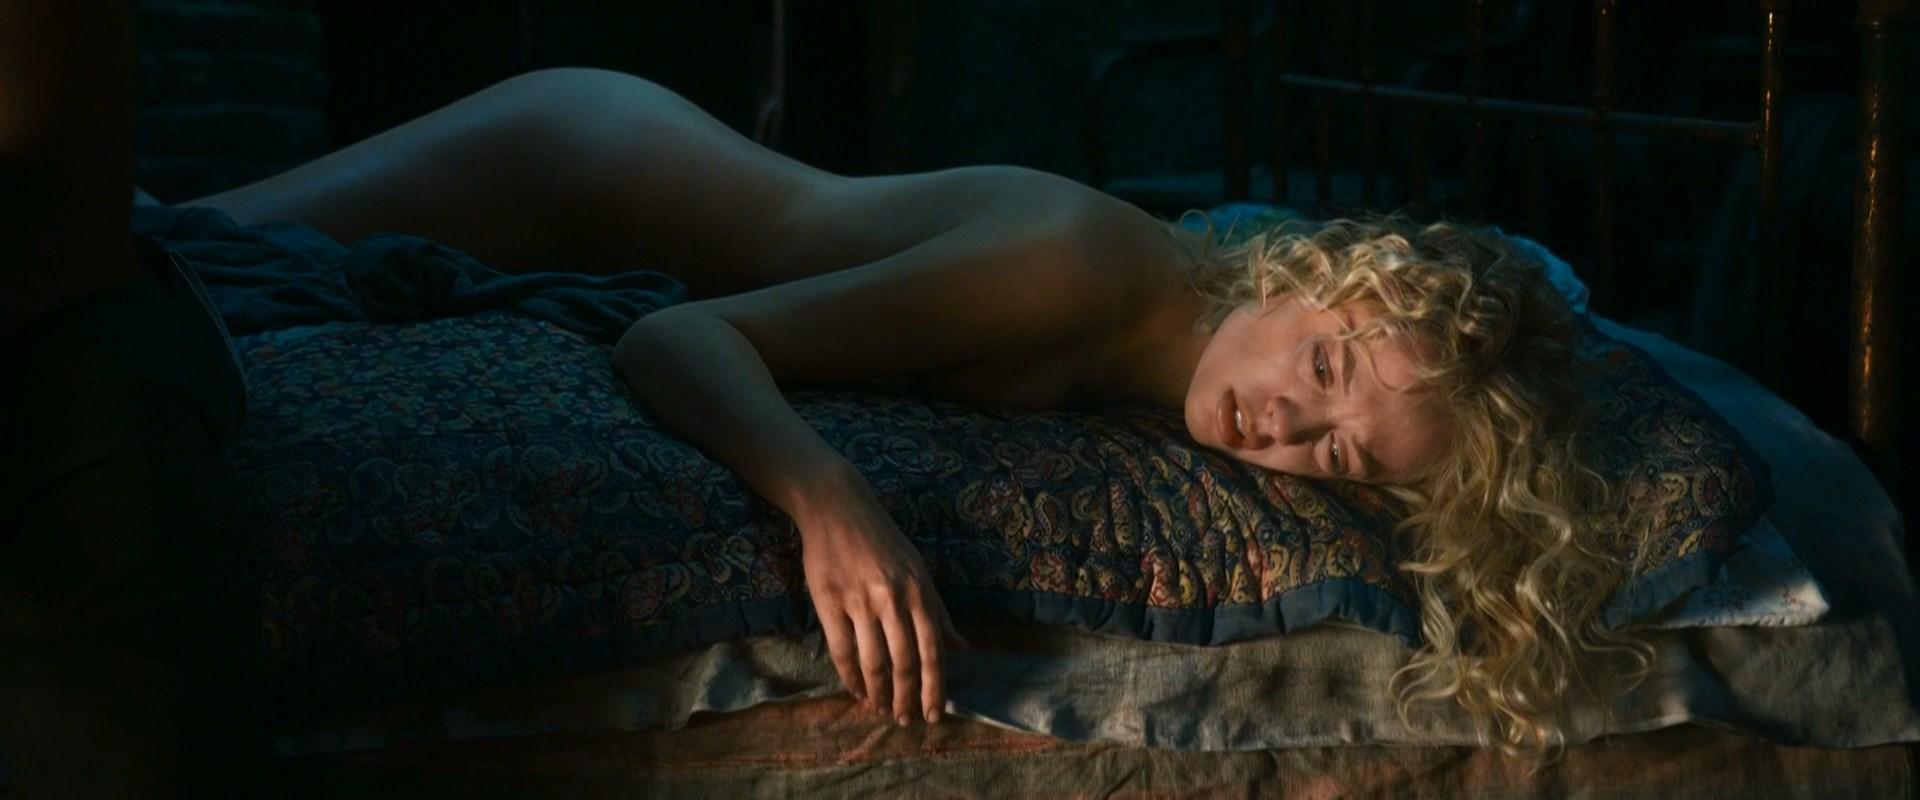 Yanina Studilina nude - Stalingrad (2013)